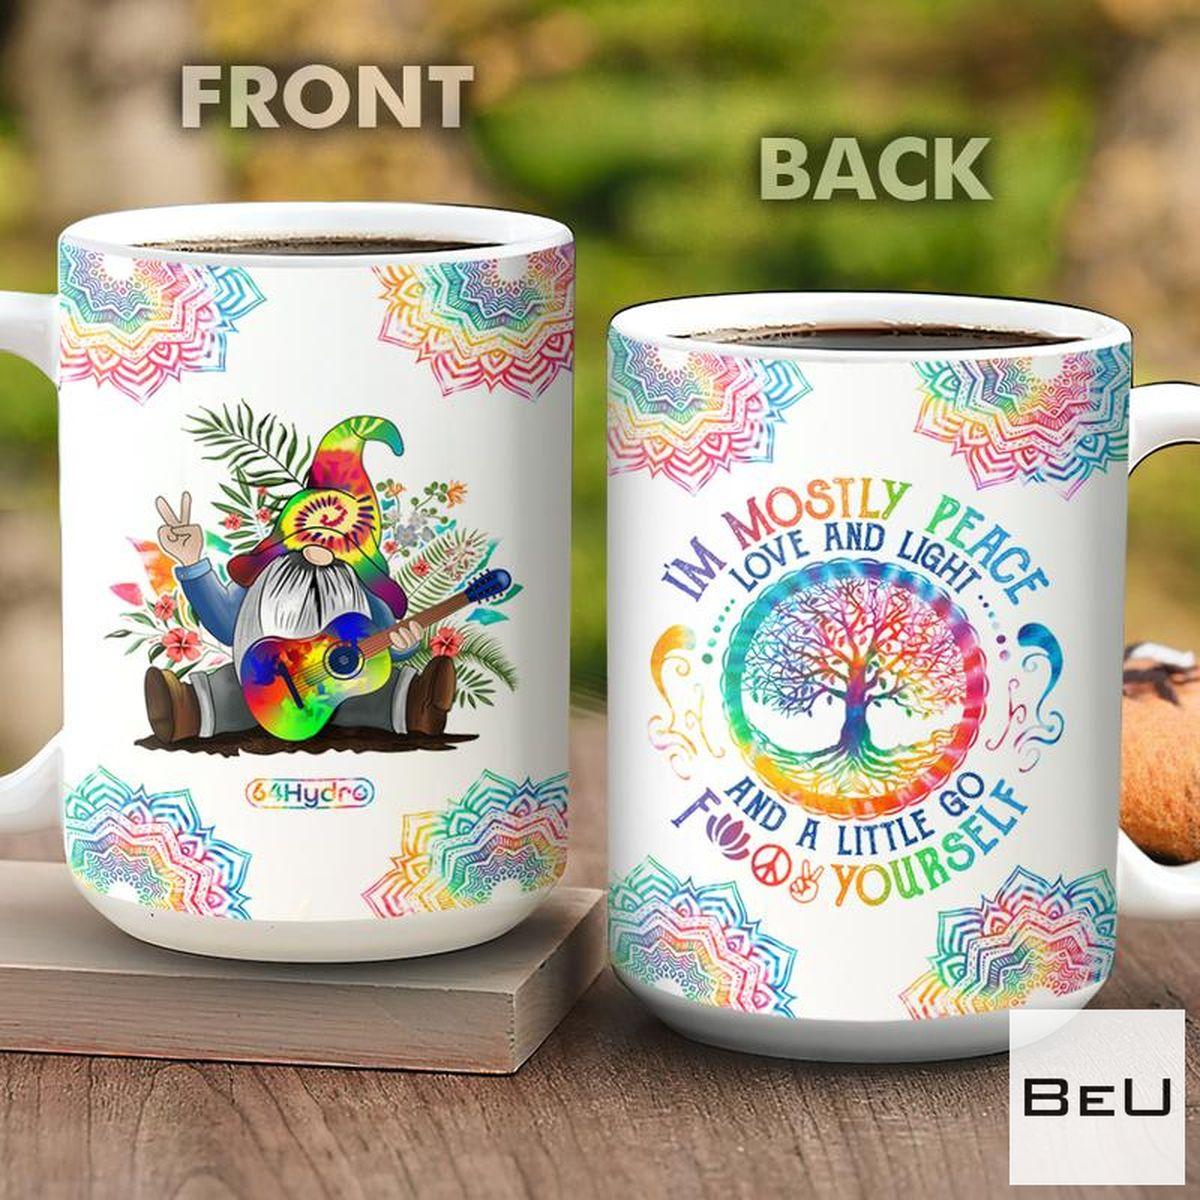 Tie Dye Gnome Hippie Soul I'm Mostly Peace Love And Light Mug